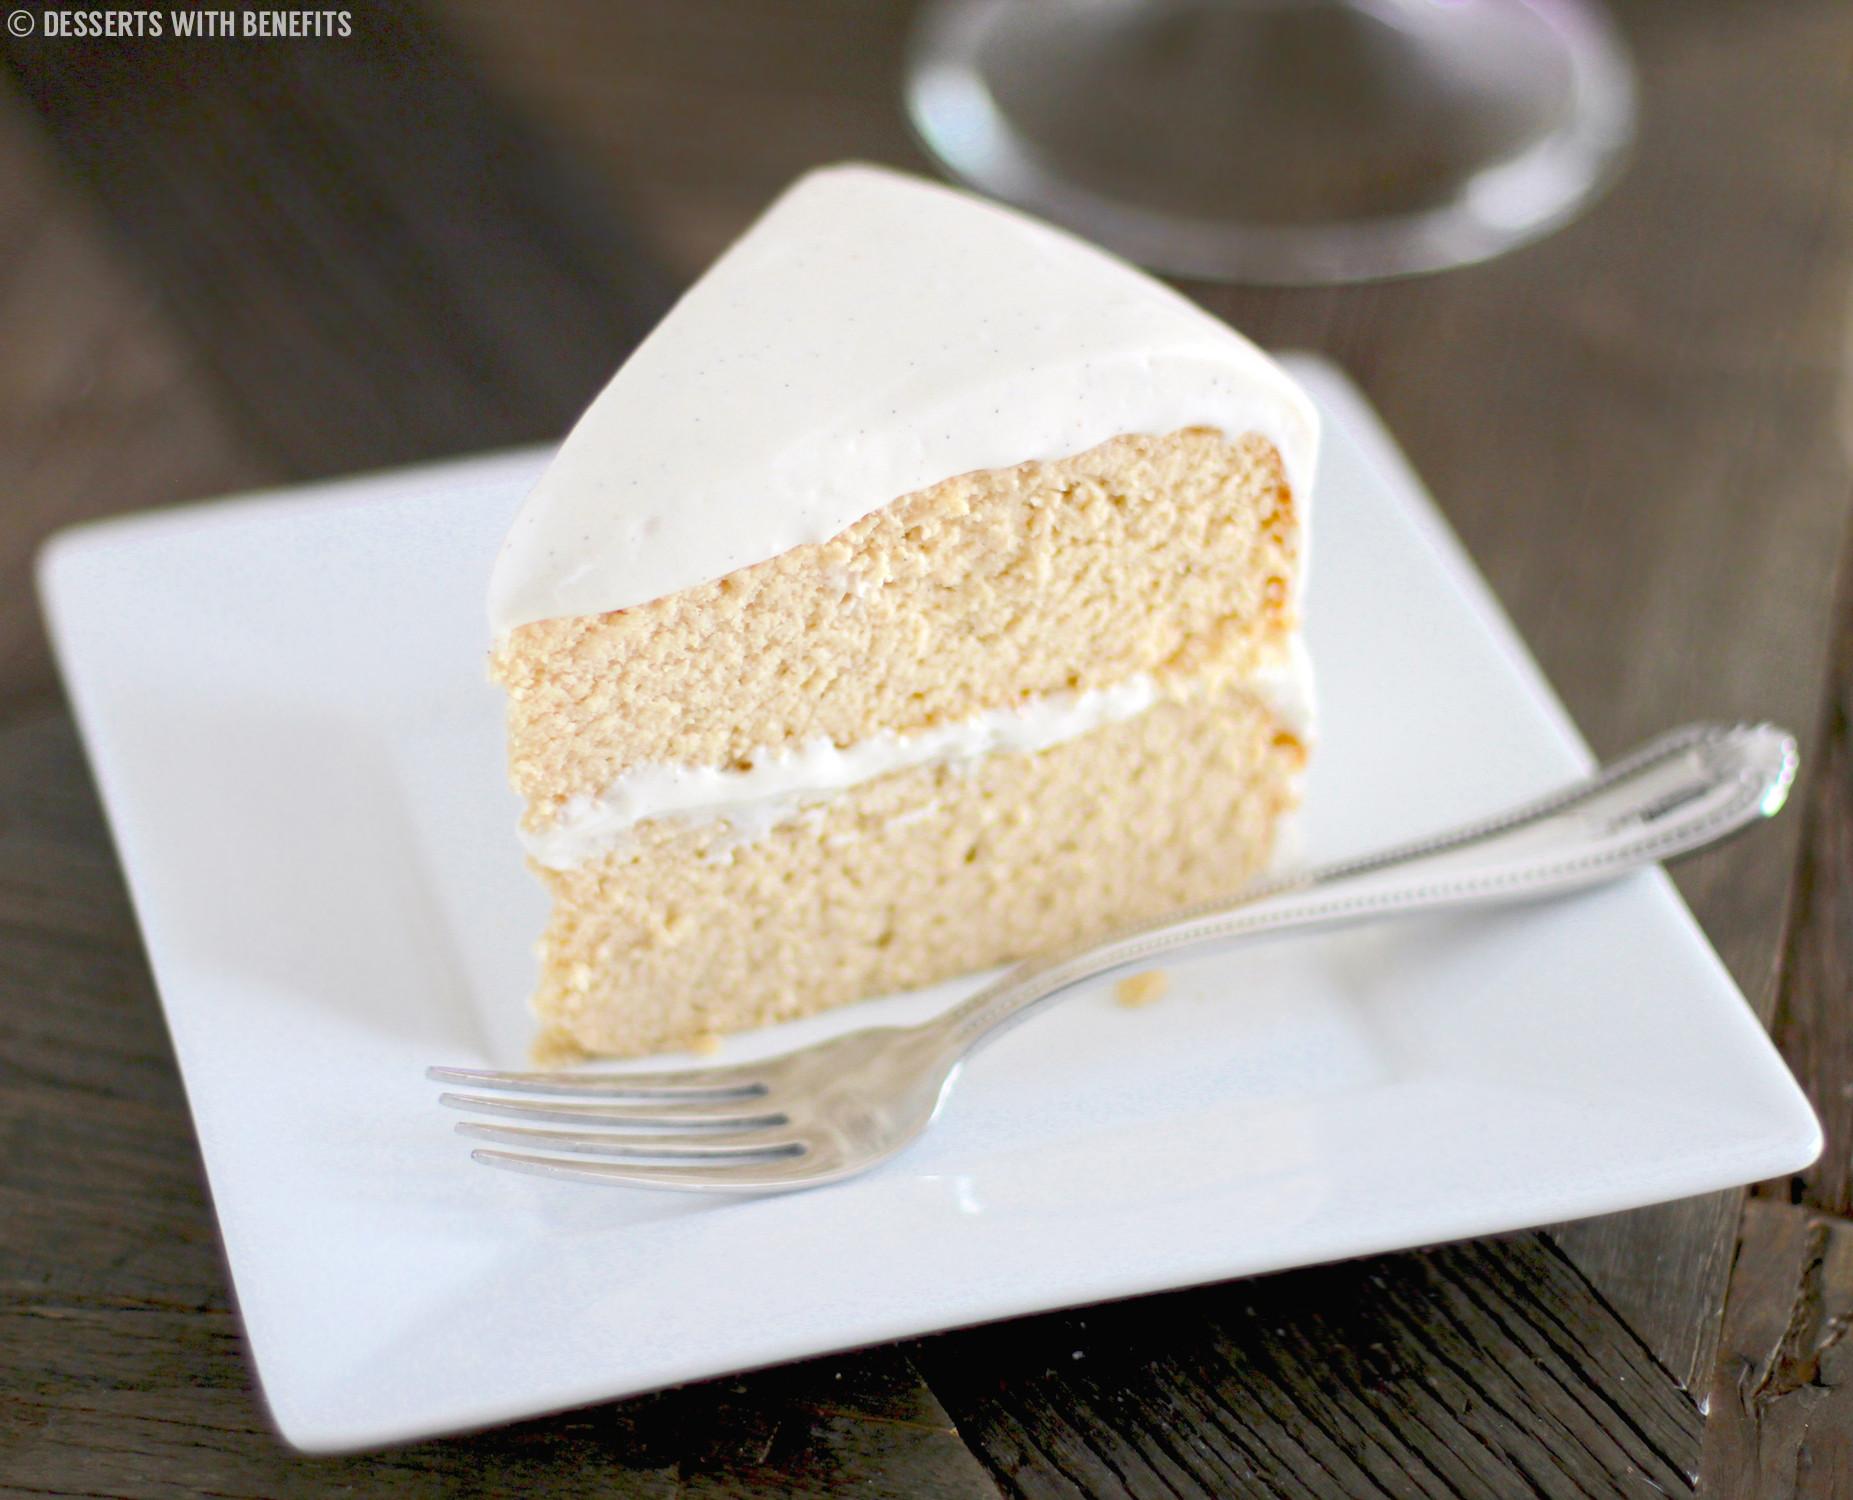 Low Carb Cream Cheese Dessert Recipes  Healthy Gluten Free Vanilla Cake